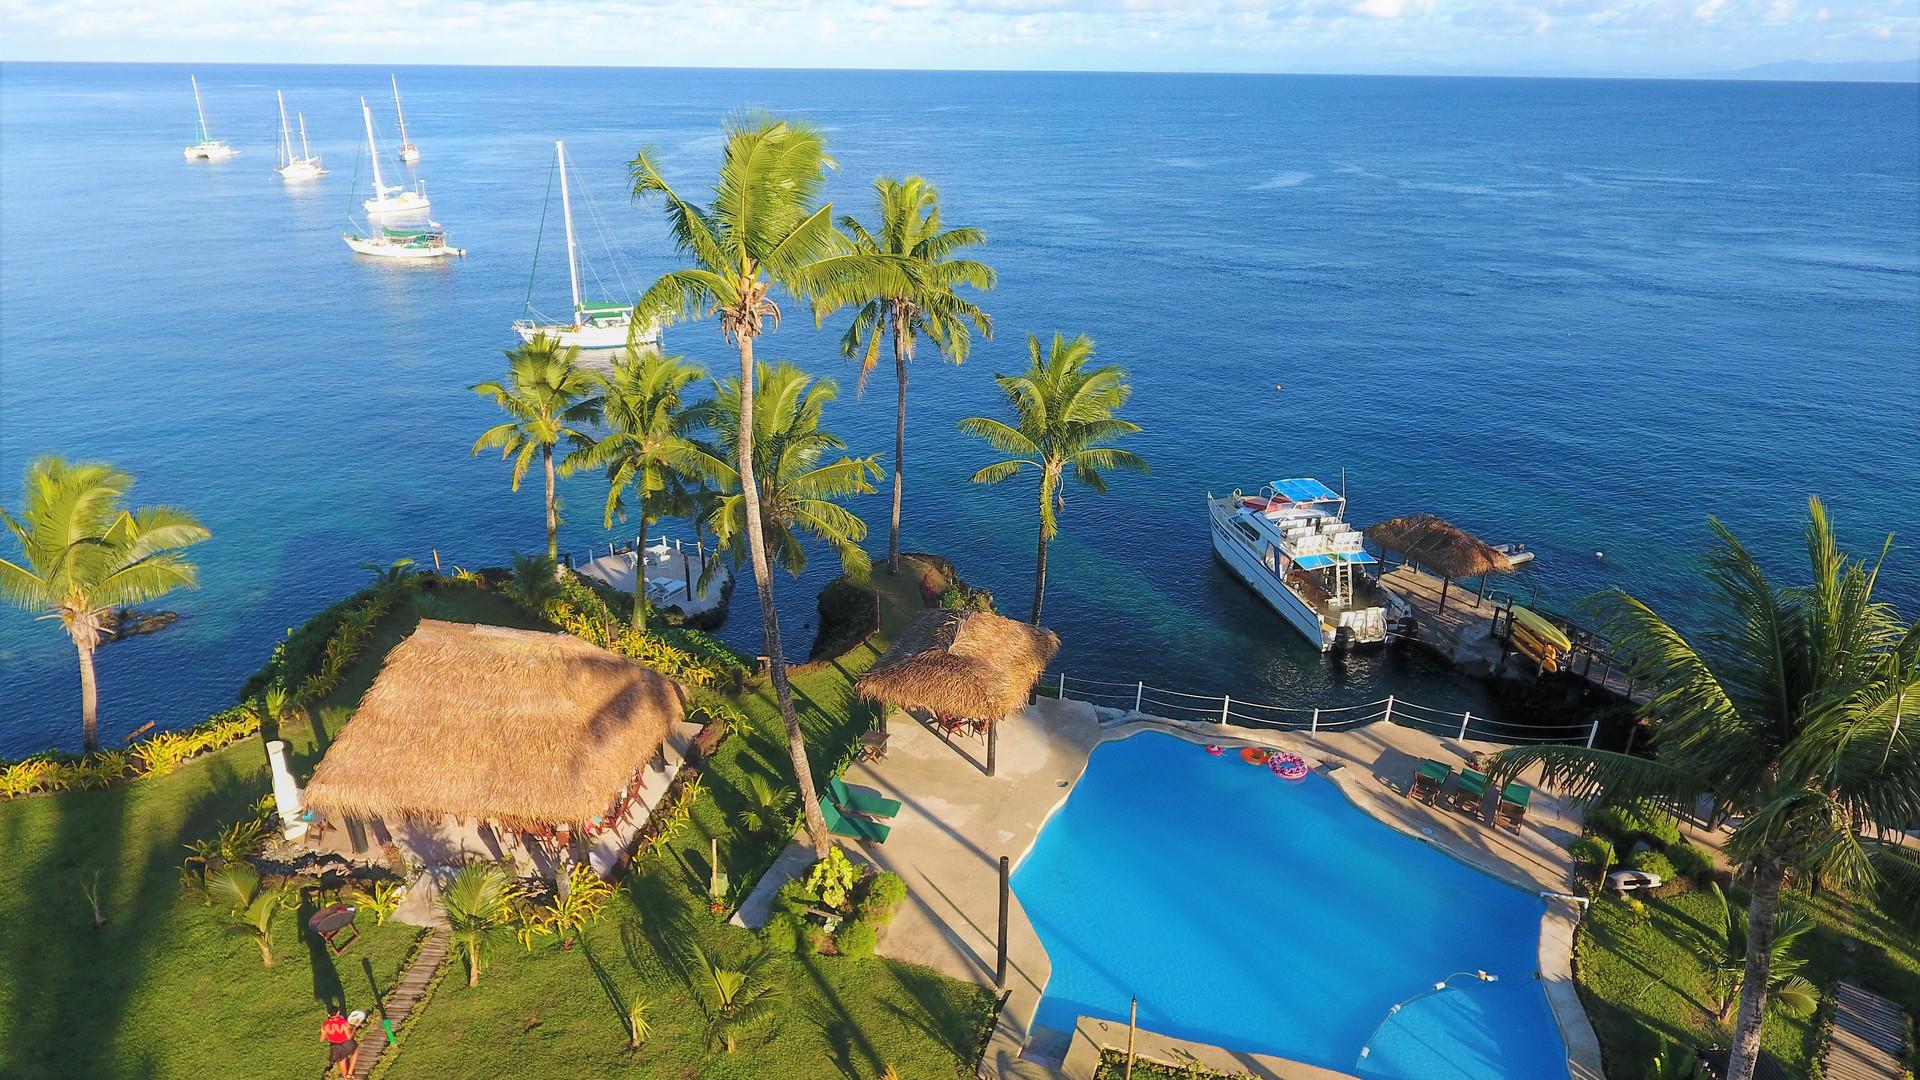 Paradise_Taveuni-Pool